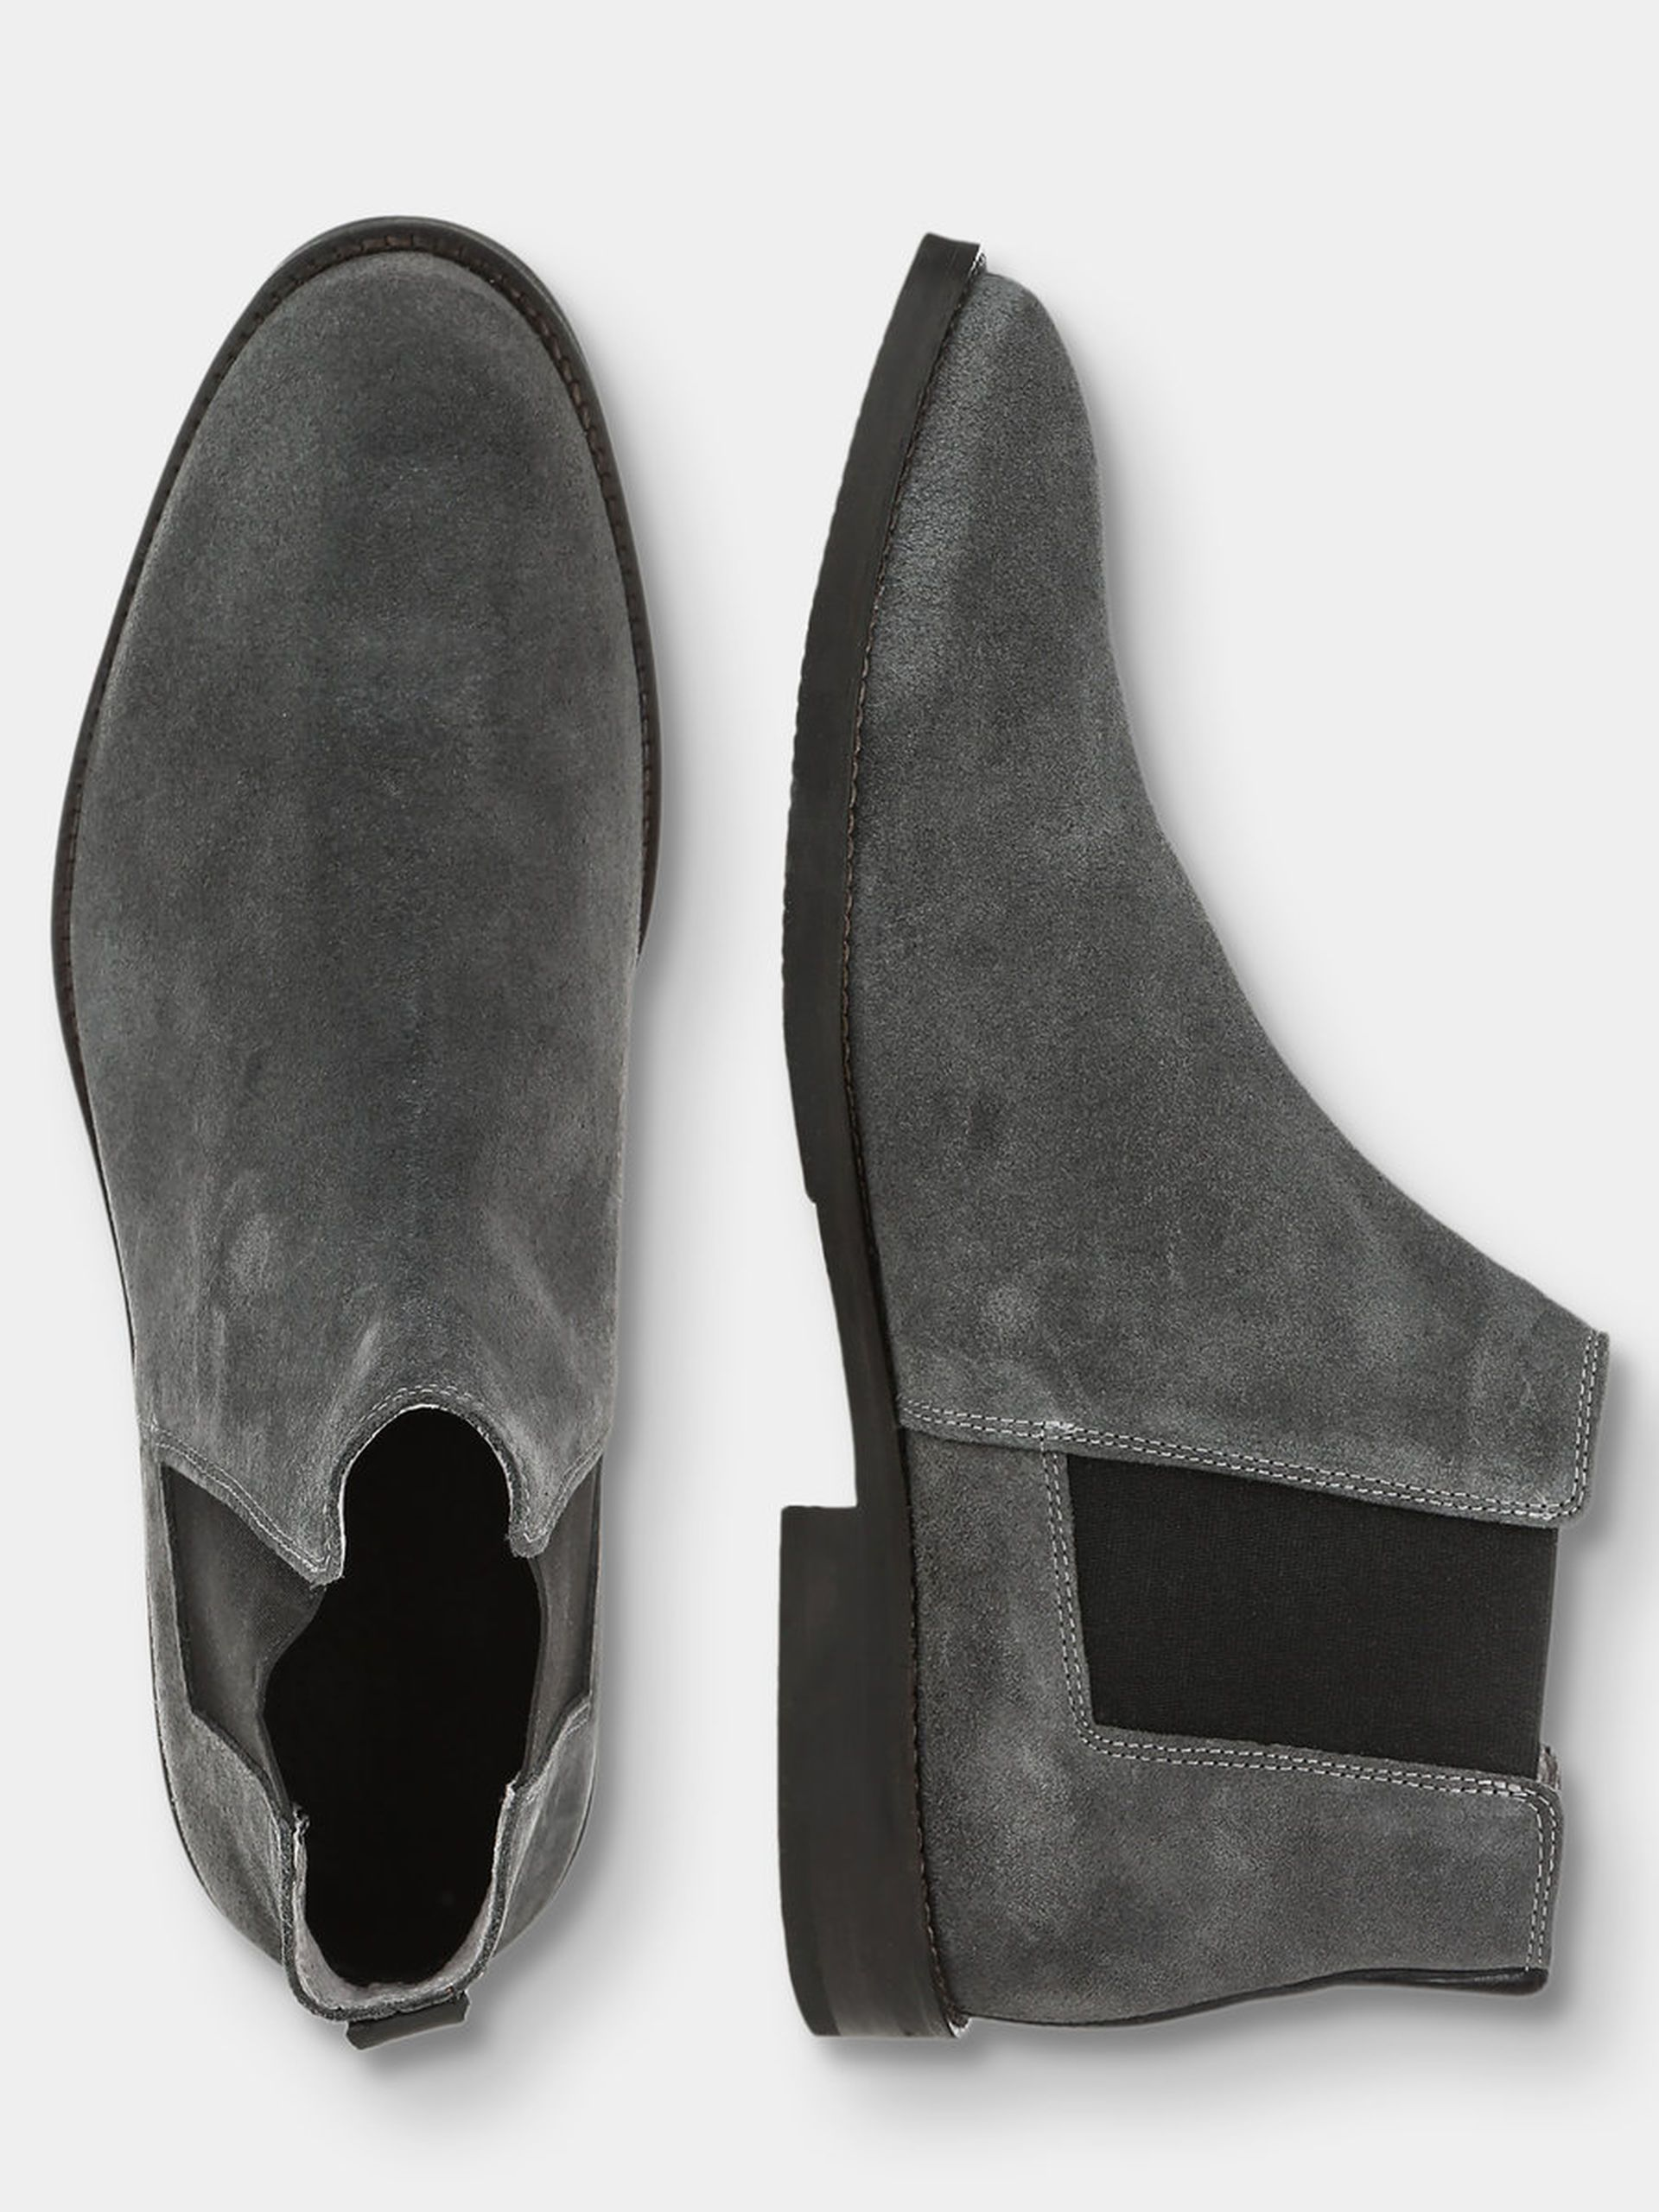 Mens M?nner Chelsea Boots Bianco Supply Cheap Online hWJePi